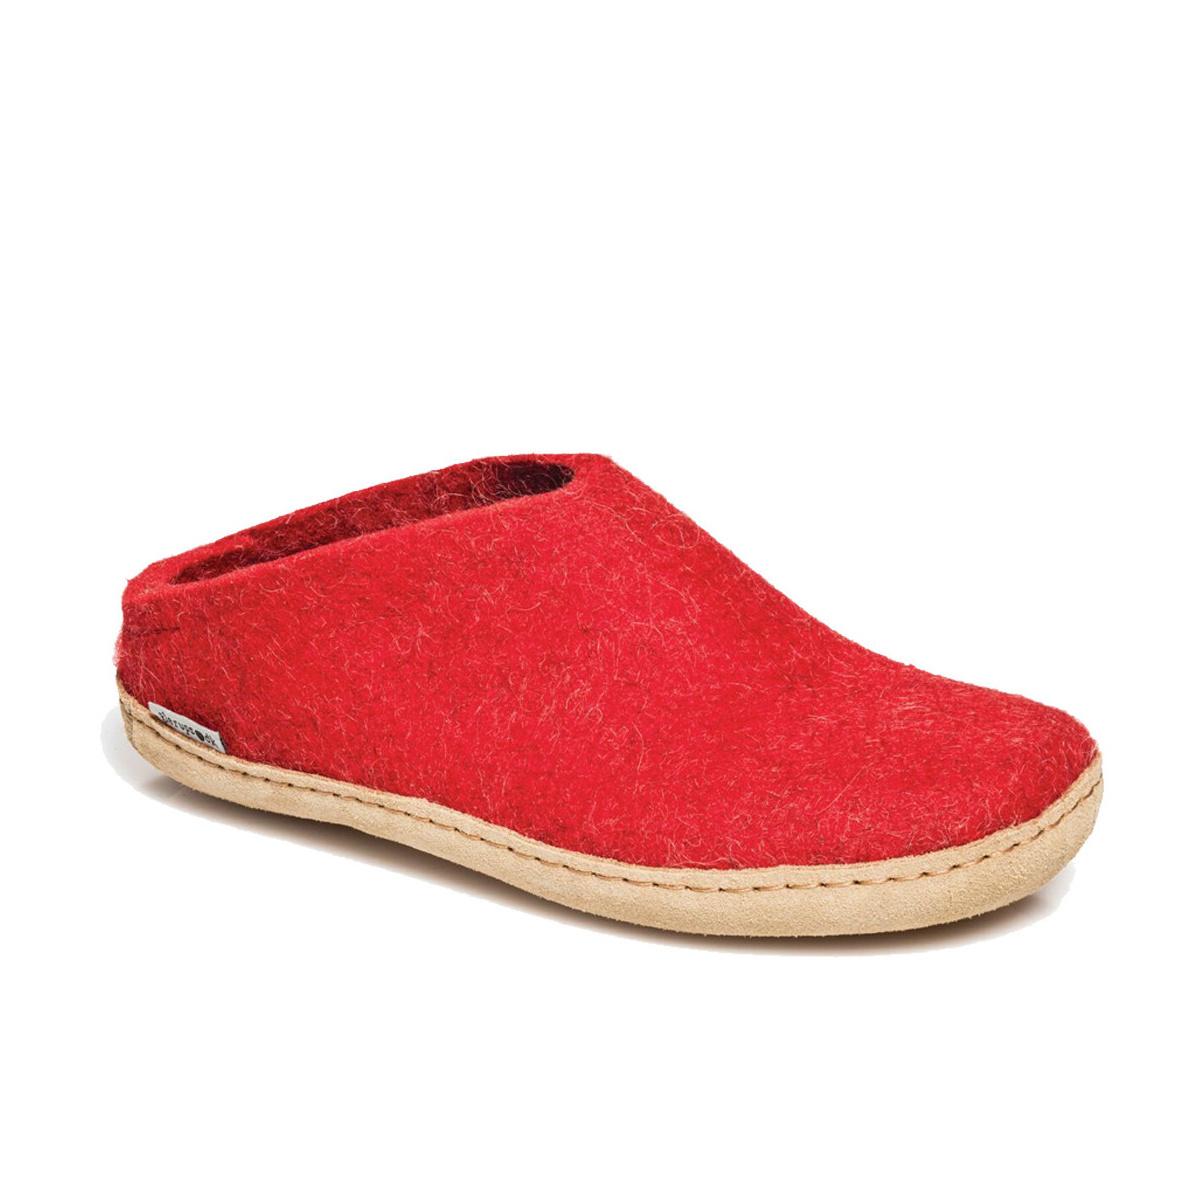 Glerups Glerups The Slipper Leather Sole Red